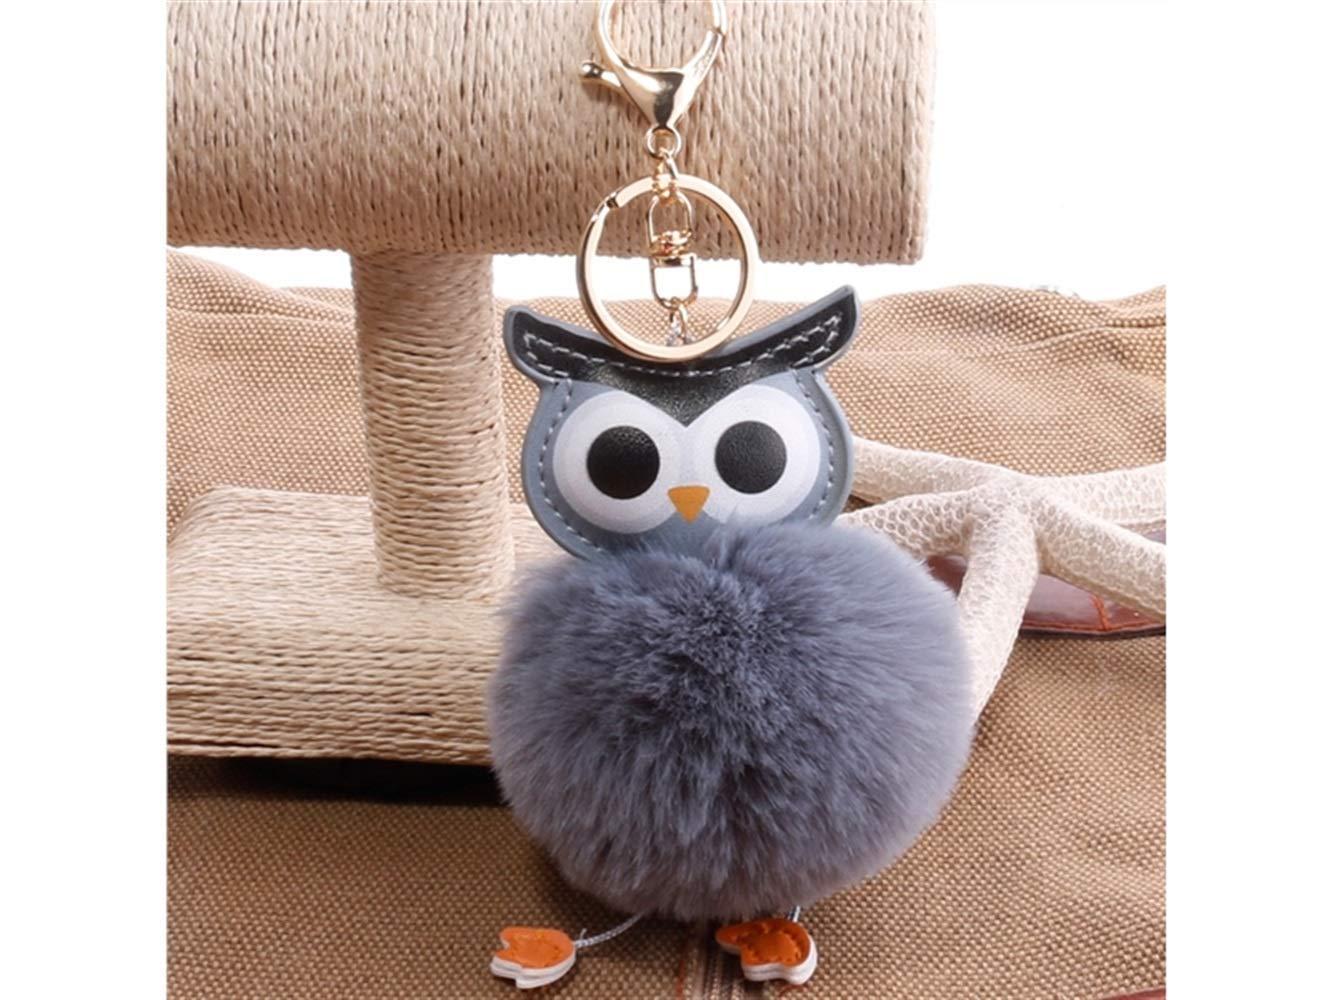 35c85d451 Get Quotations · Gelaiken Plush Keyring Soft Plush Ball Keychain?Double-Sided  PU Owl Keyring Ladies Bag